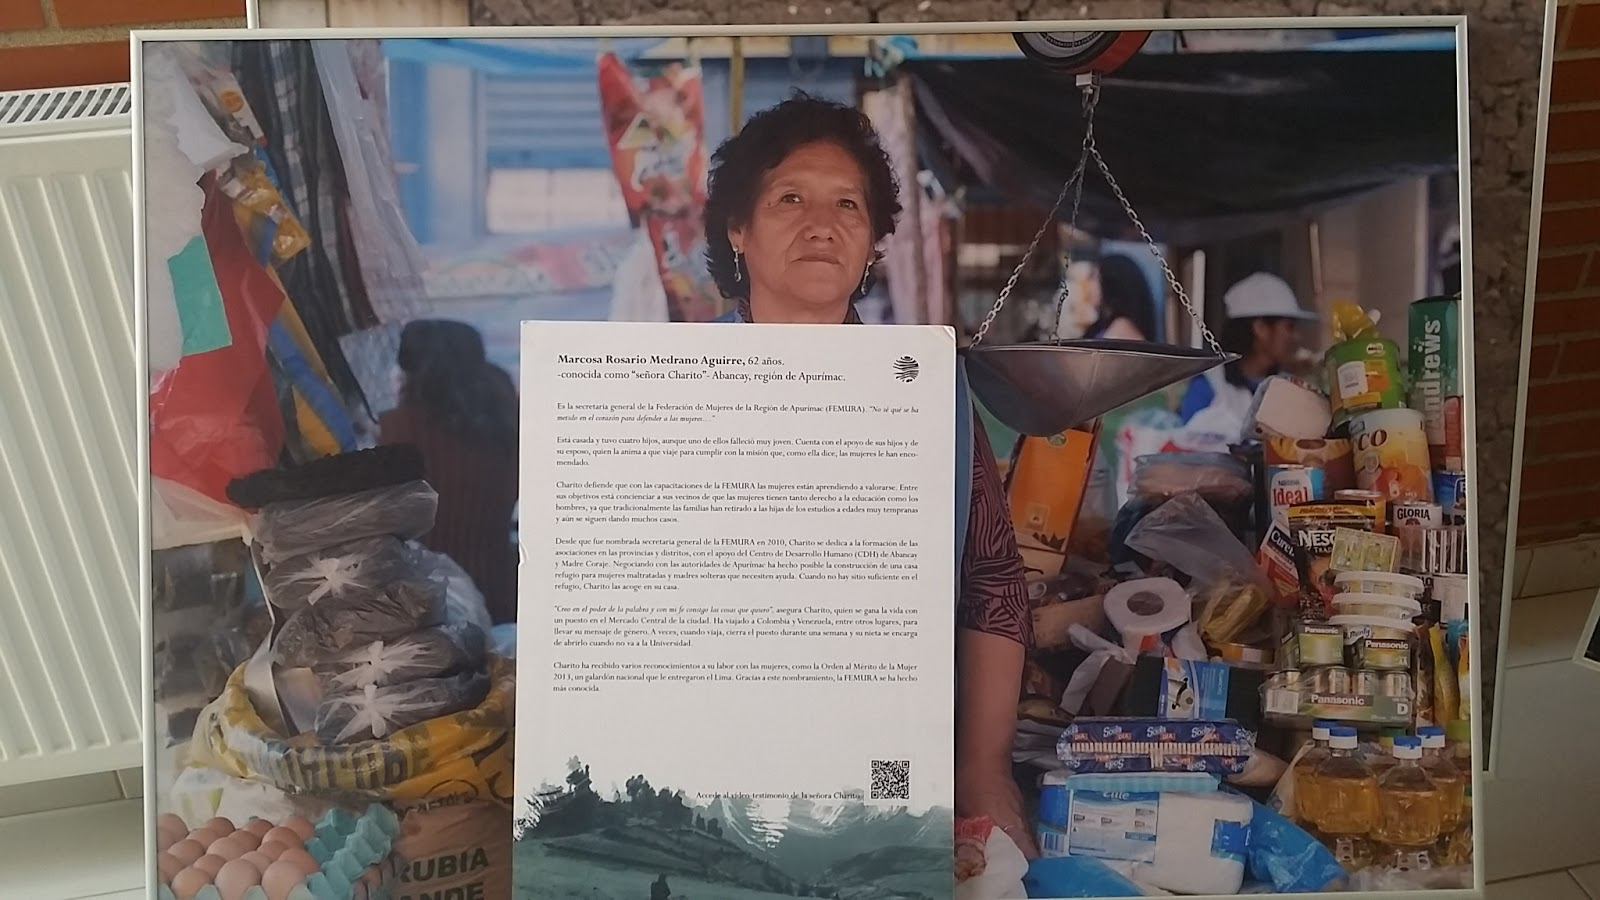 Mujeres solteras abancay apurimac